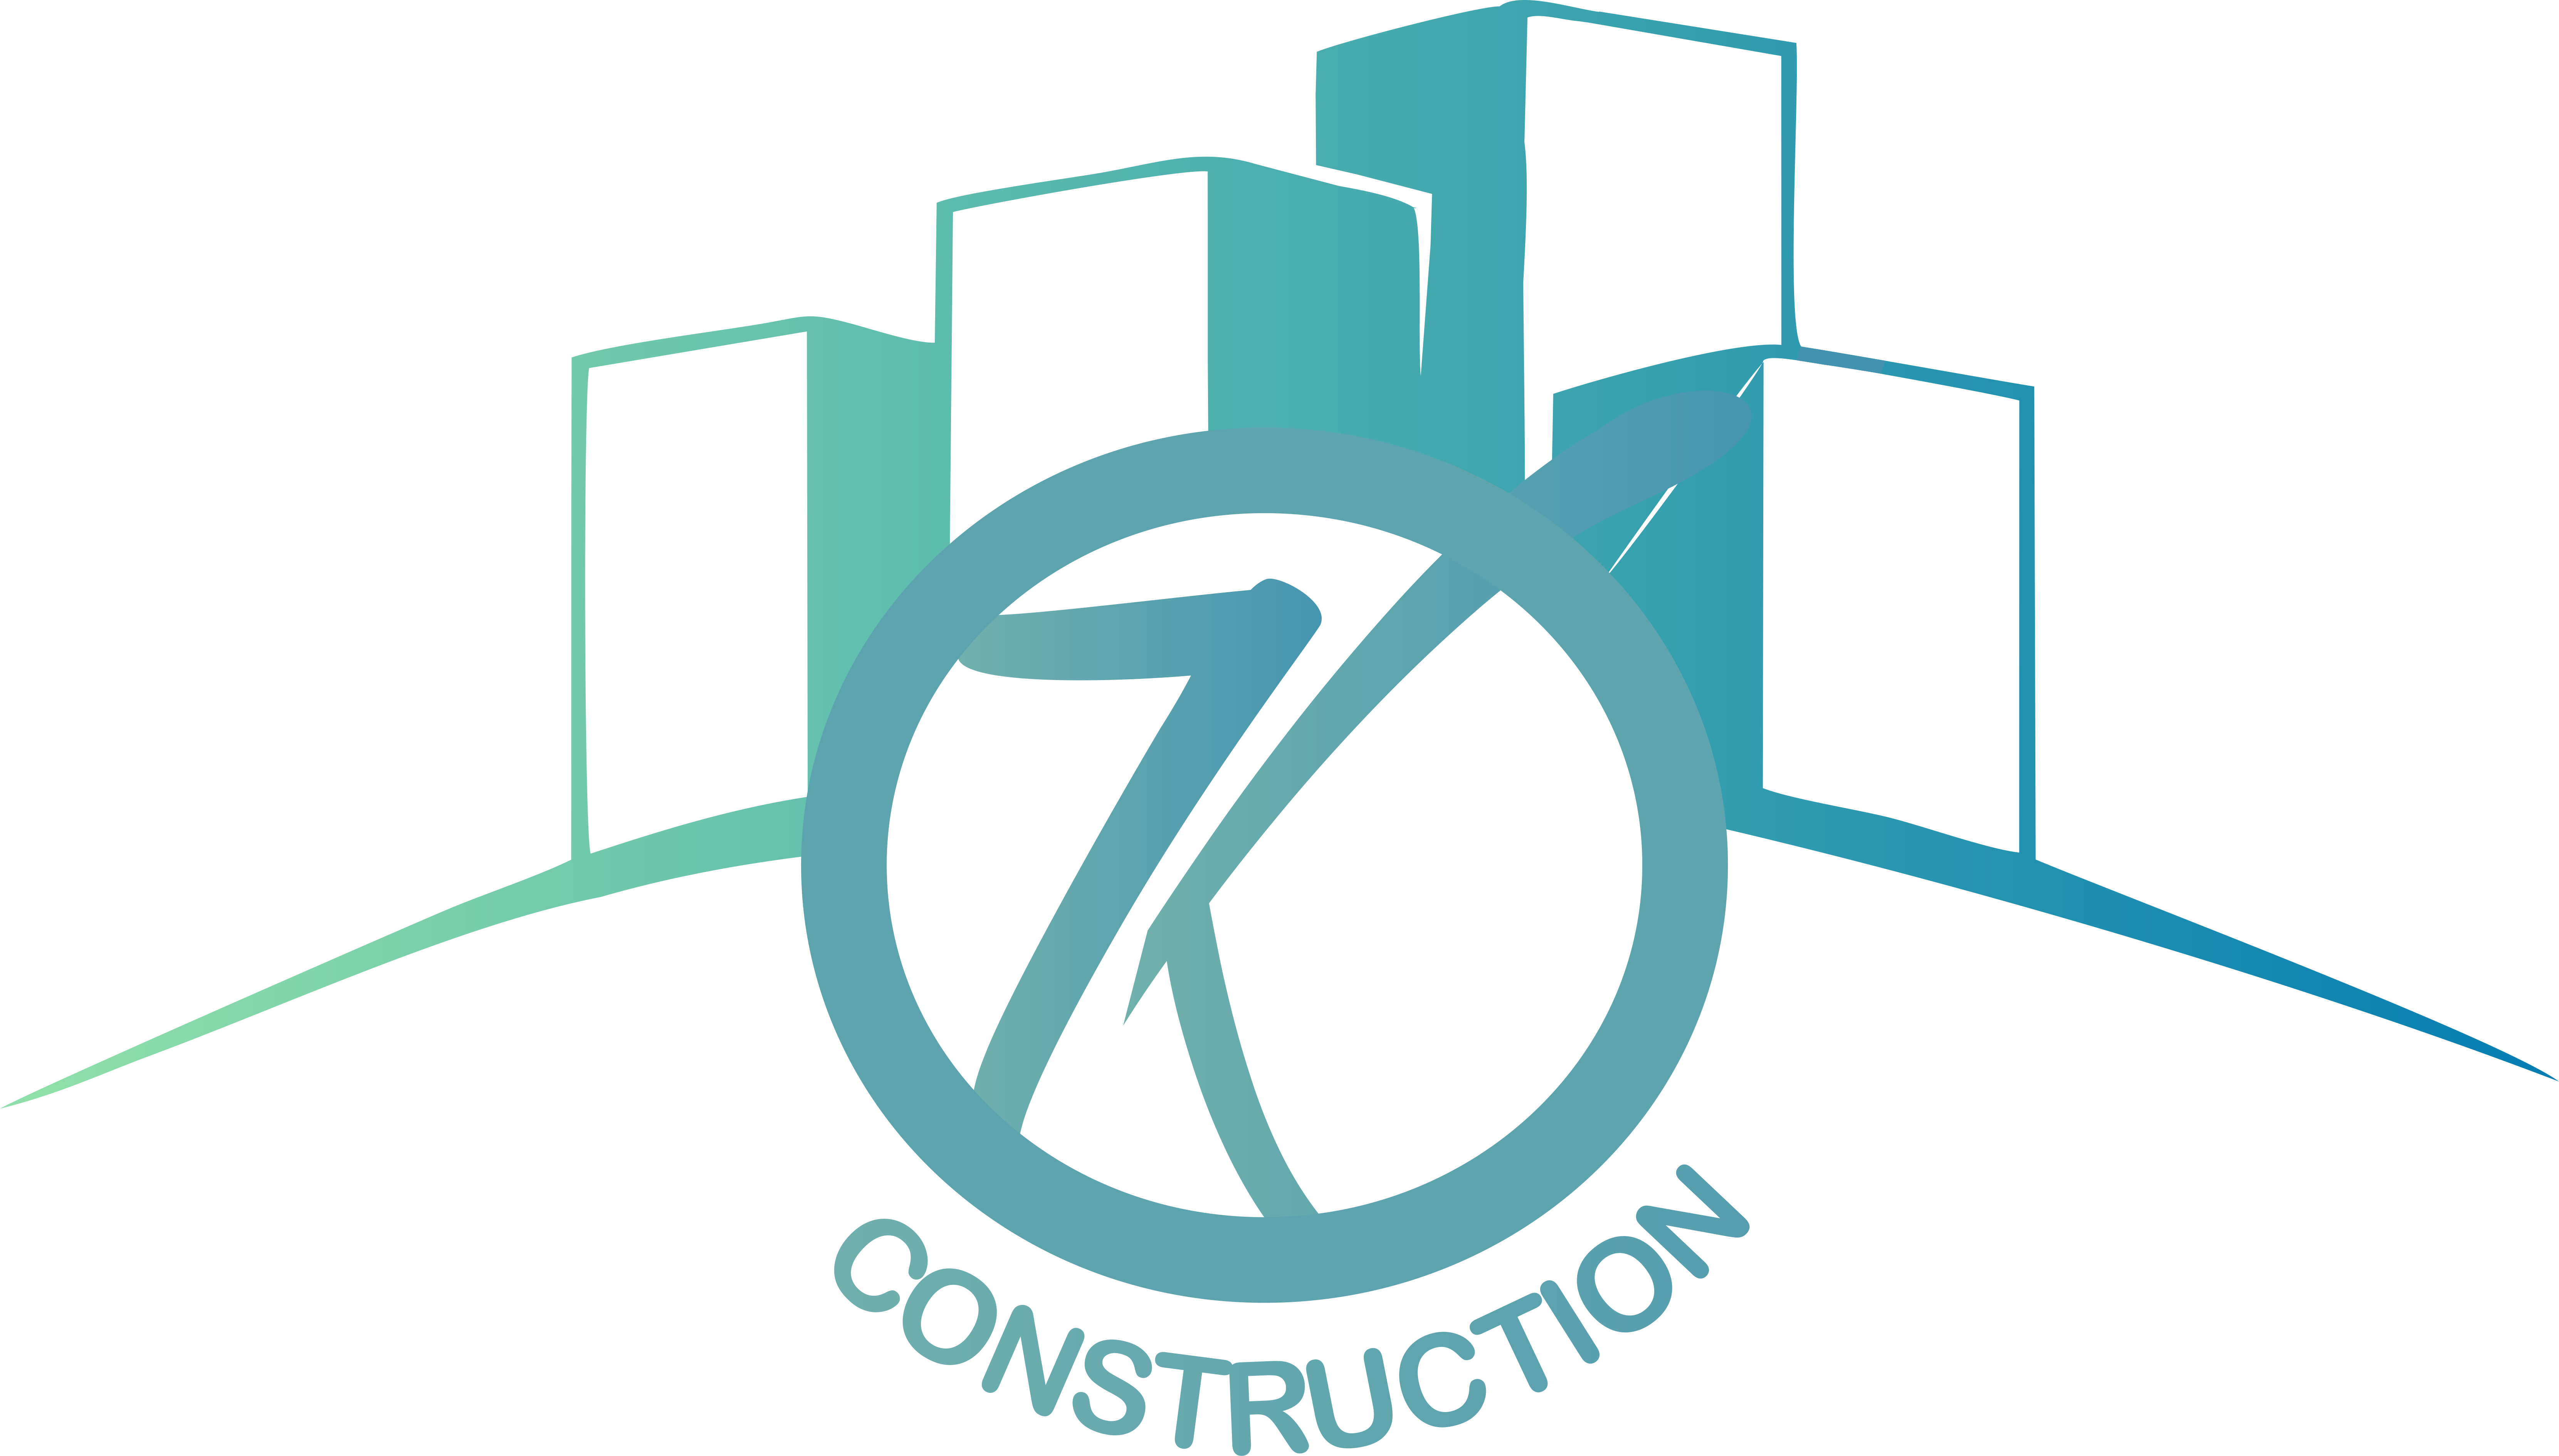 7K Constructions